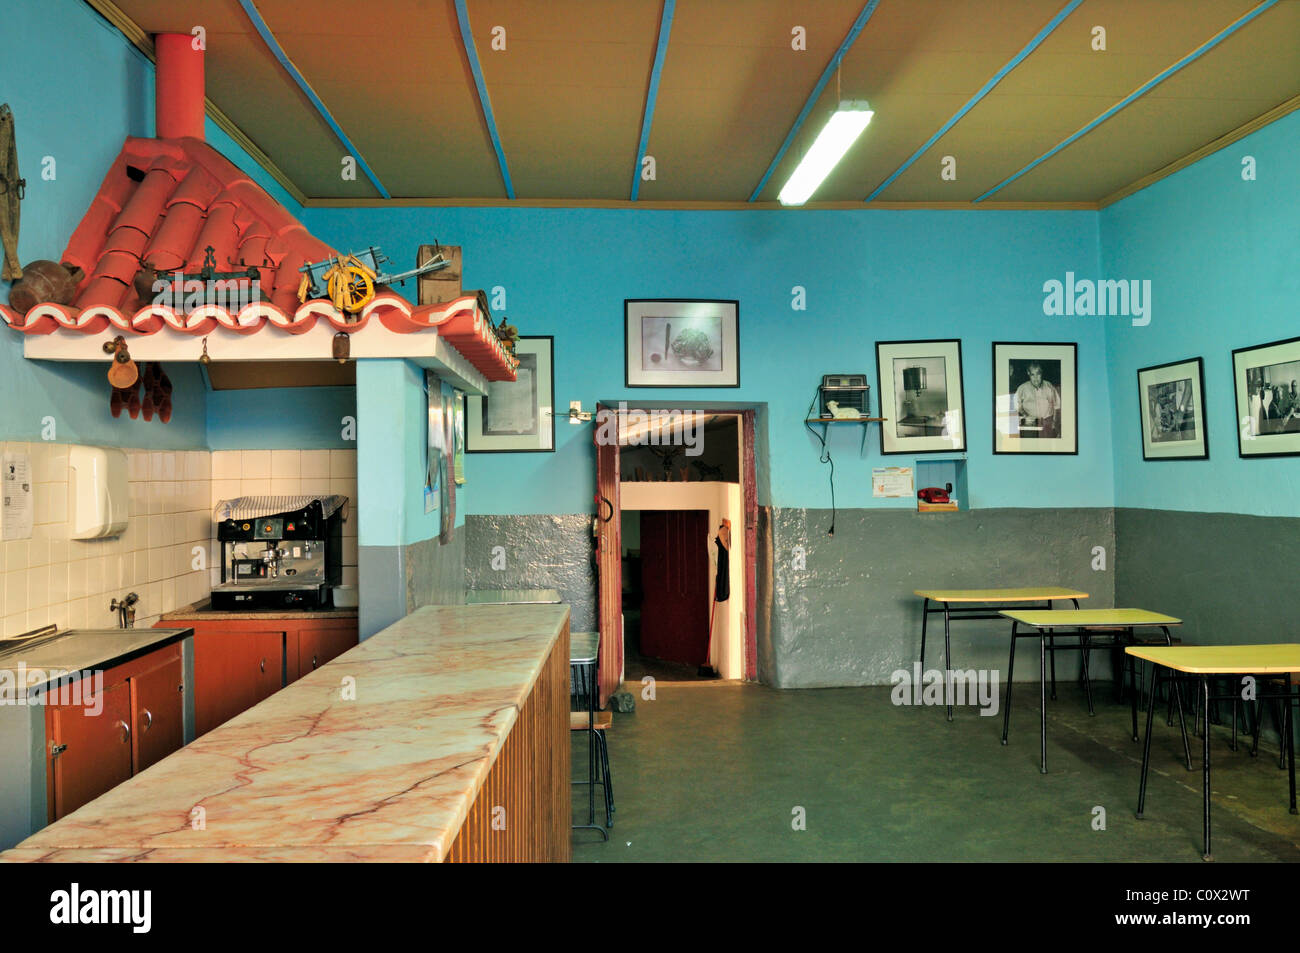 Portugal, Algentejo: Tavern 'Joao das Cabecas' in Castro Verde - Stock Image